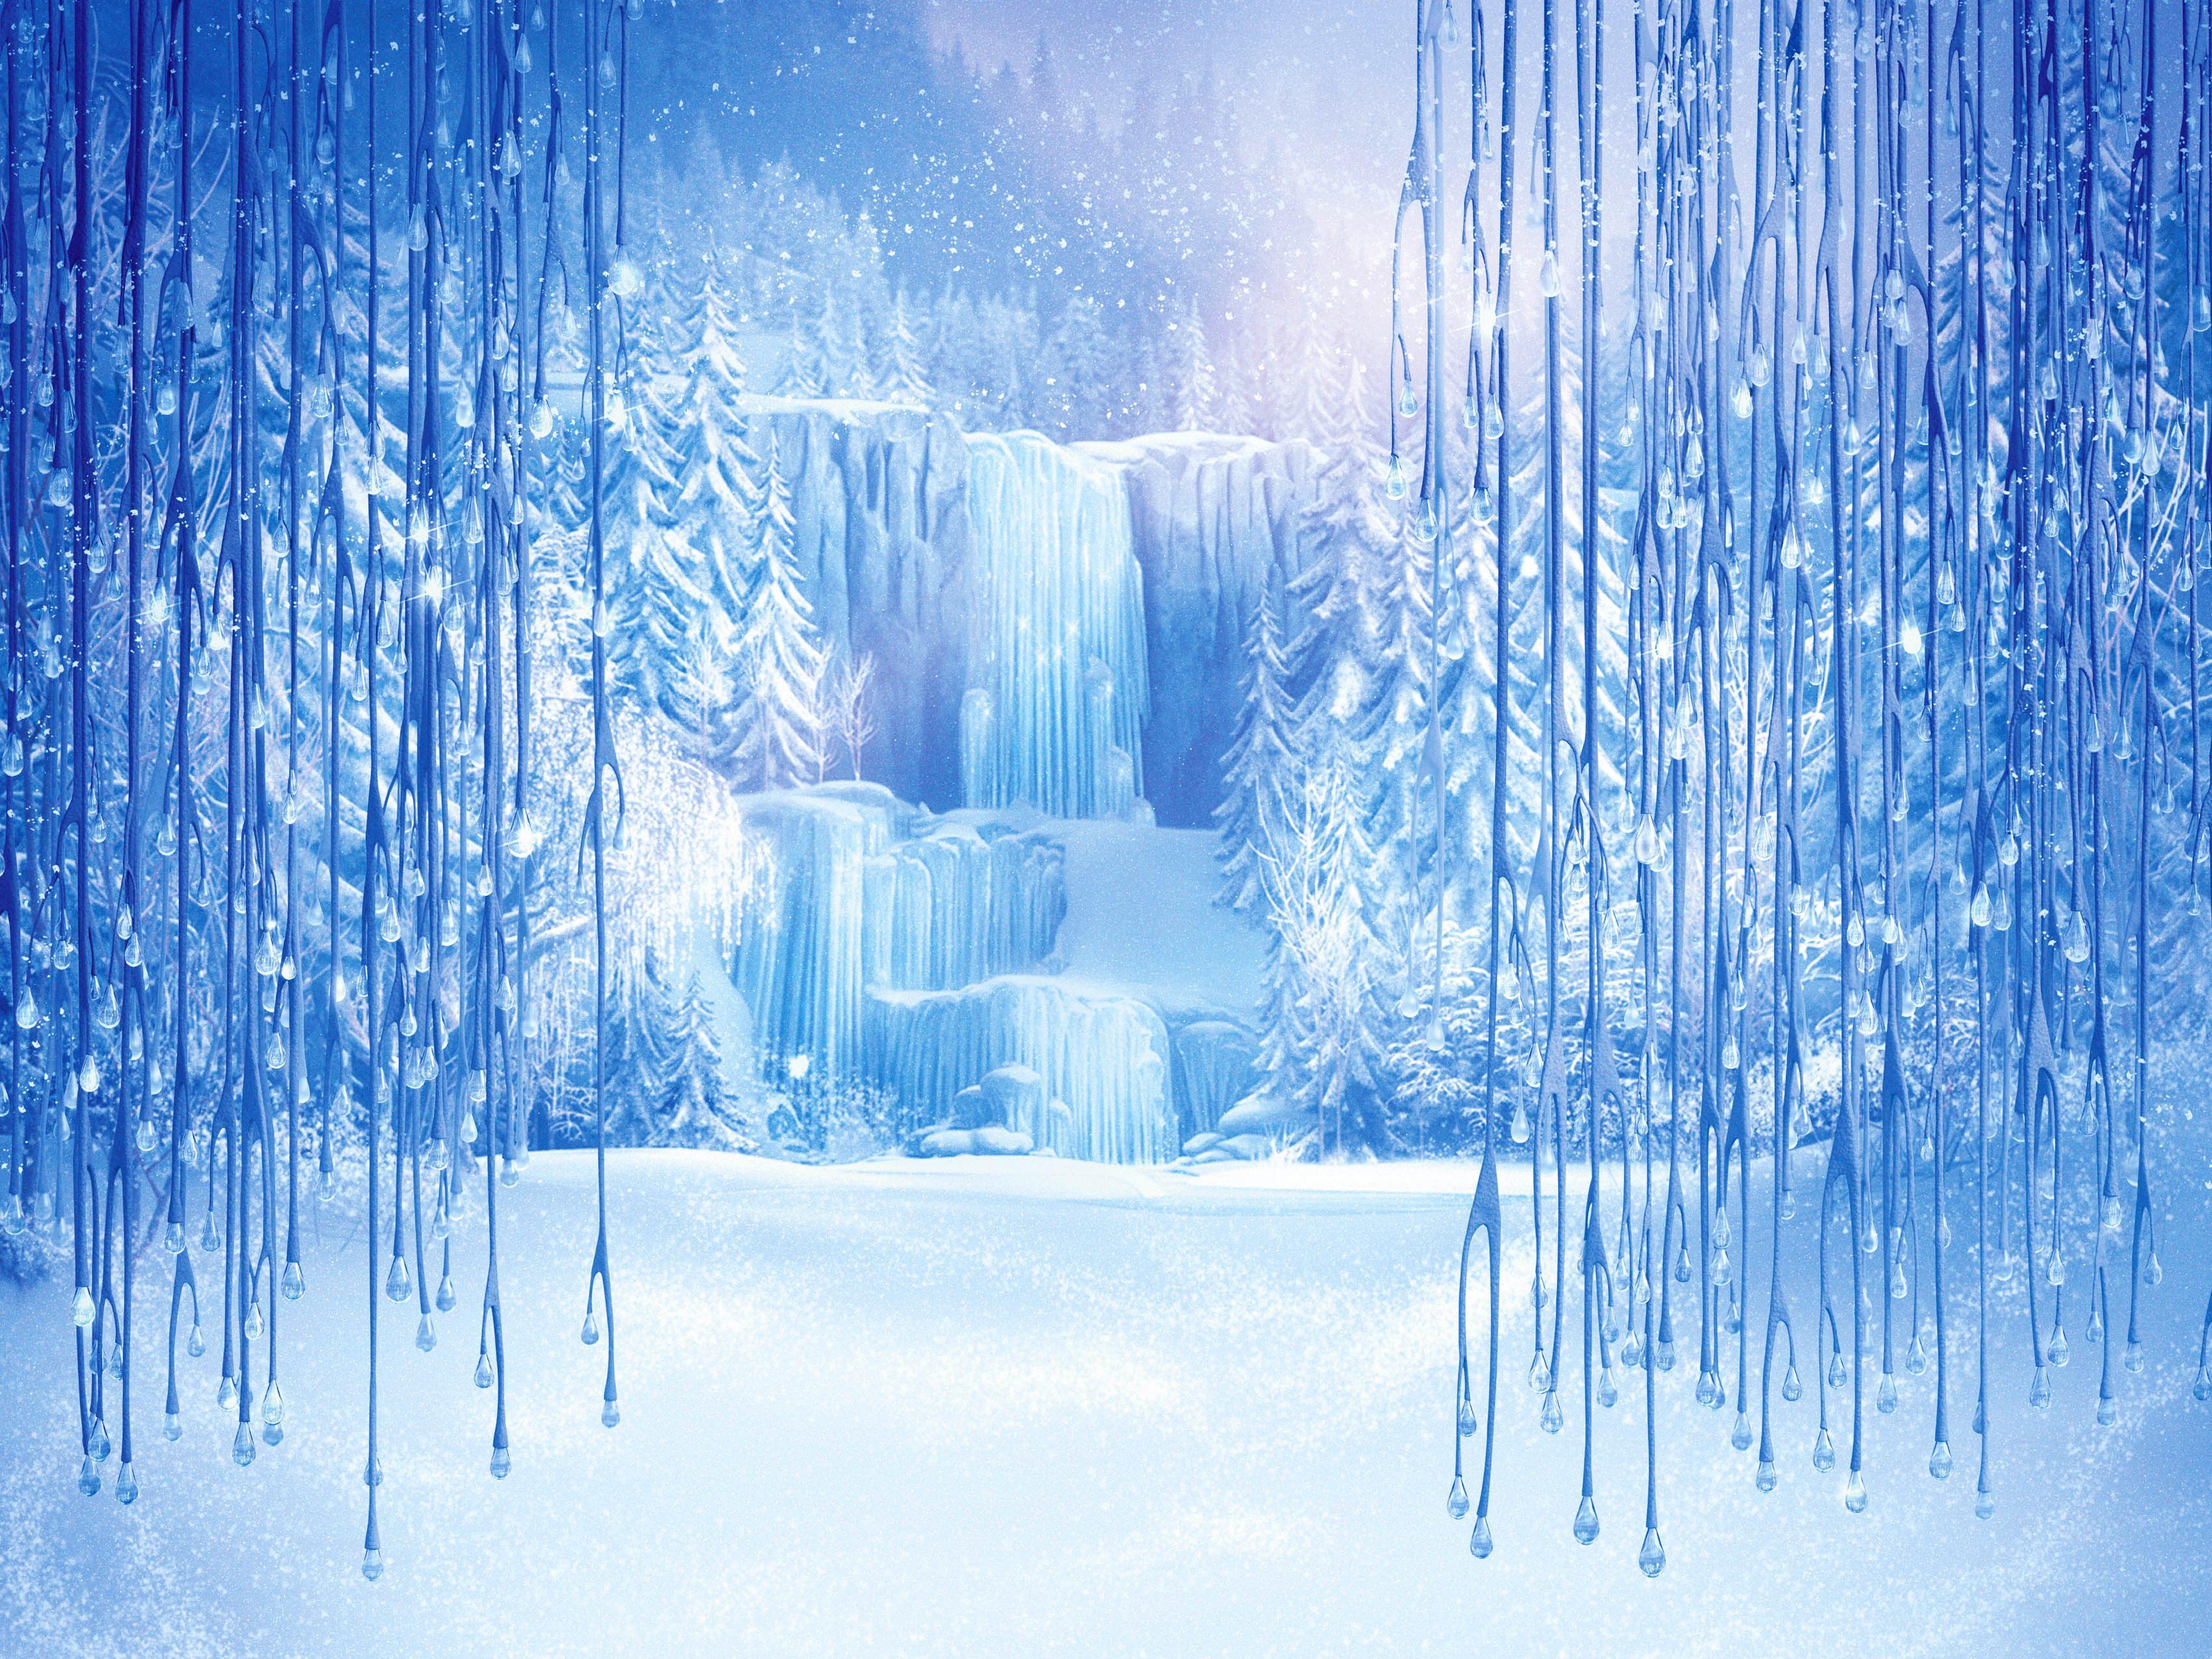 Frozen 2013 Wallpaper Movie Desktop Wallpapers HD Wallpapers 4000x3000